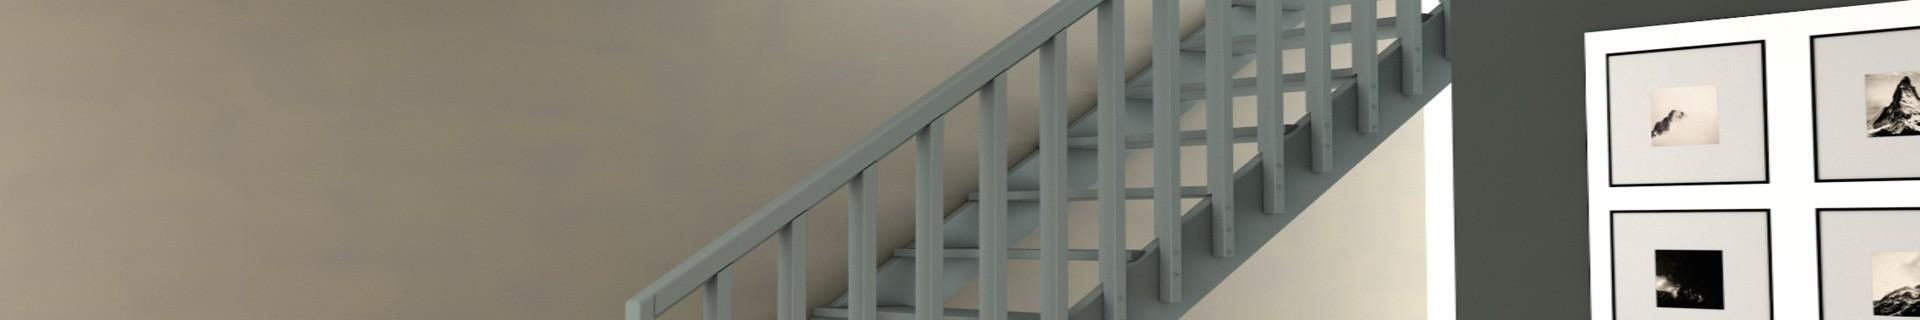 L'escalier ABIES en pin, de la marque Burger- La Boutique Booa